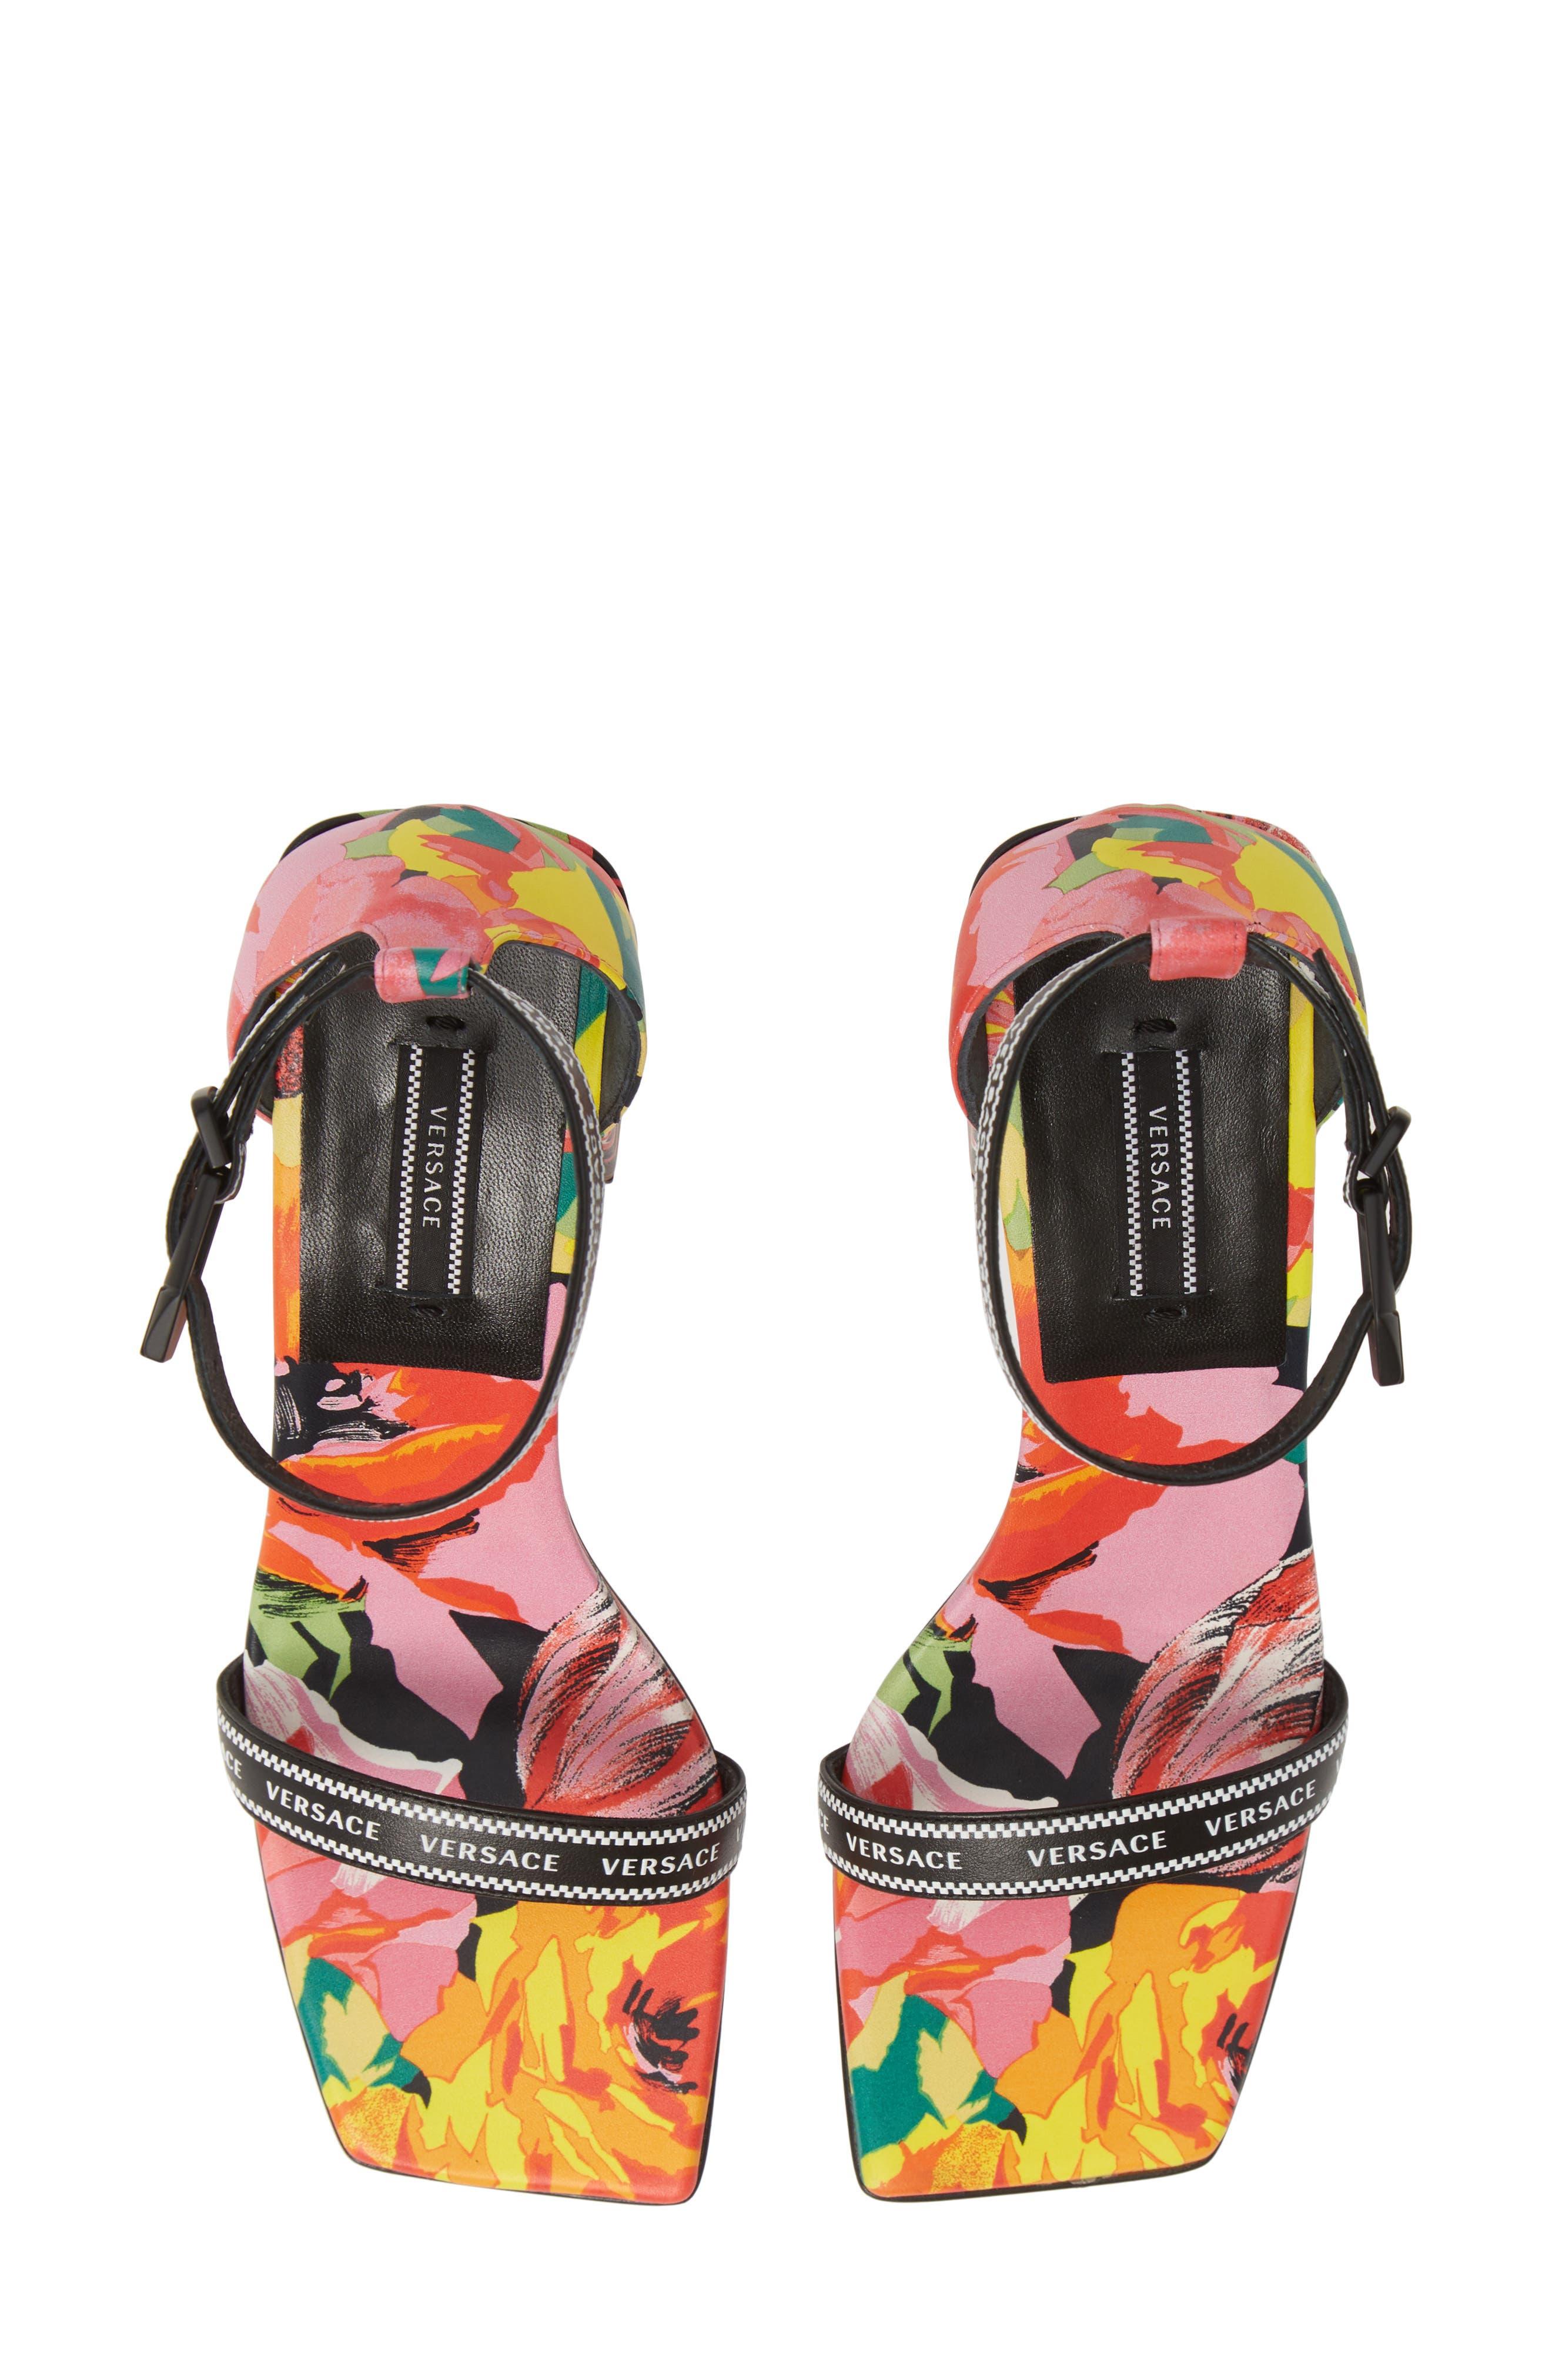 VERSACE FIRST LINE Floral Logo Ankle Strap Sandal, Main, color, BLACK PRINT